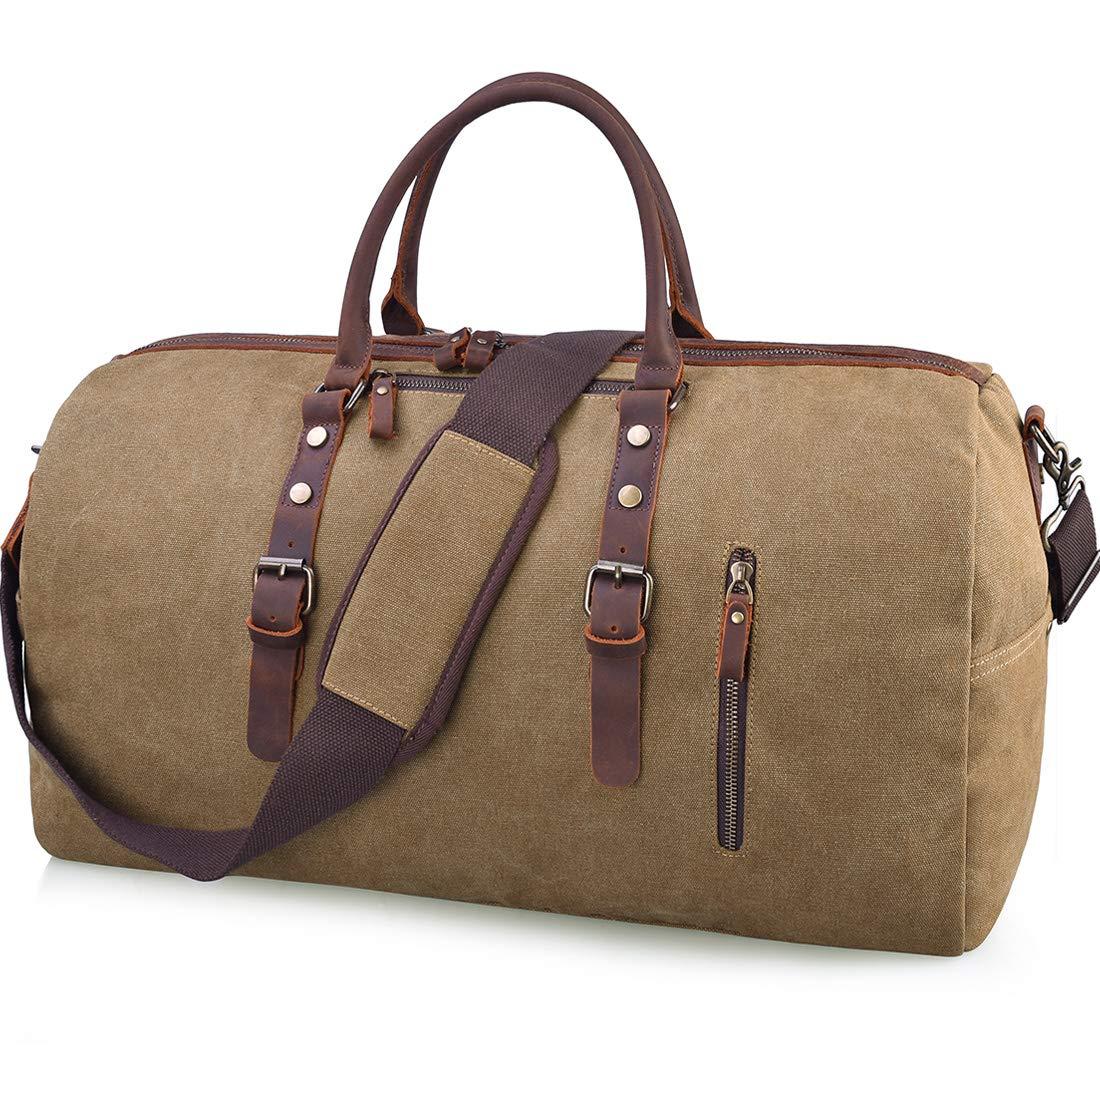 6d46229d7d Amazon.com  Travel Duffel Bag Large Canvas Duffle Bag for Men Women Leather Weekender  Overnight Bag Carryon Weekend Bag Brown  JCX US